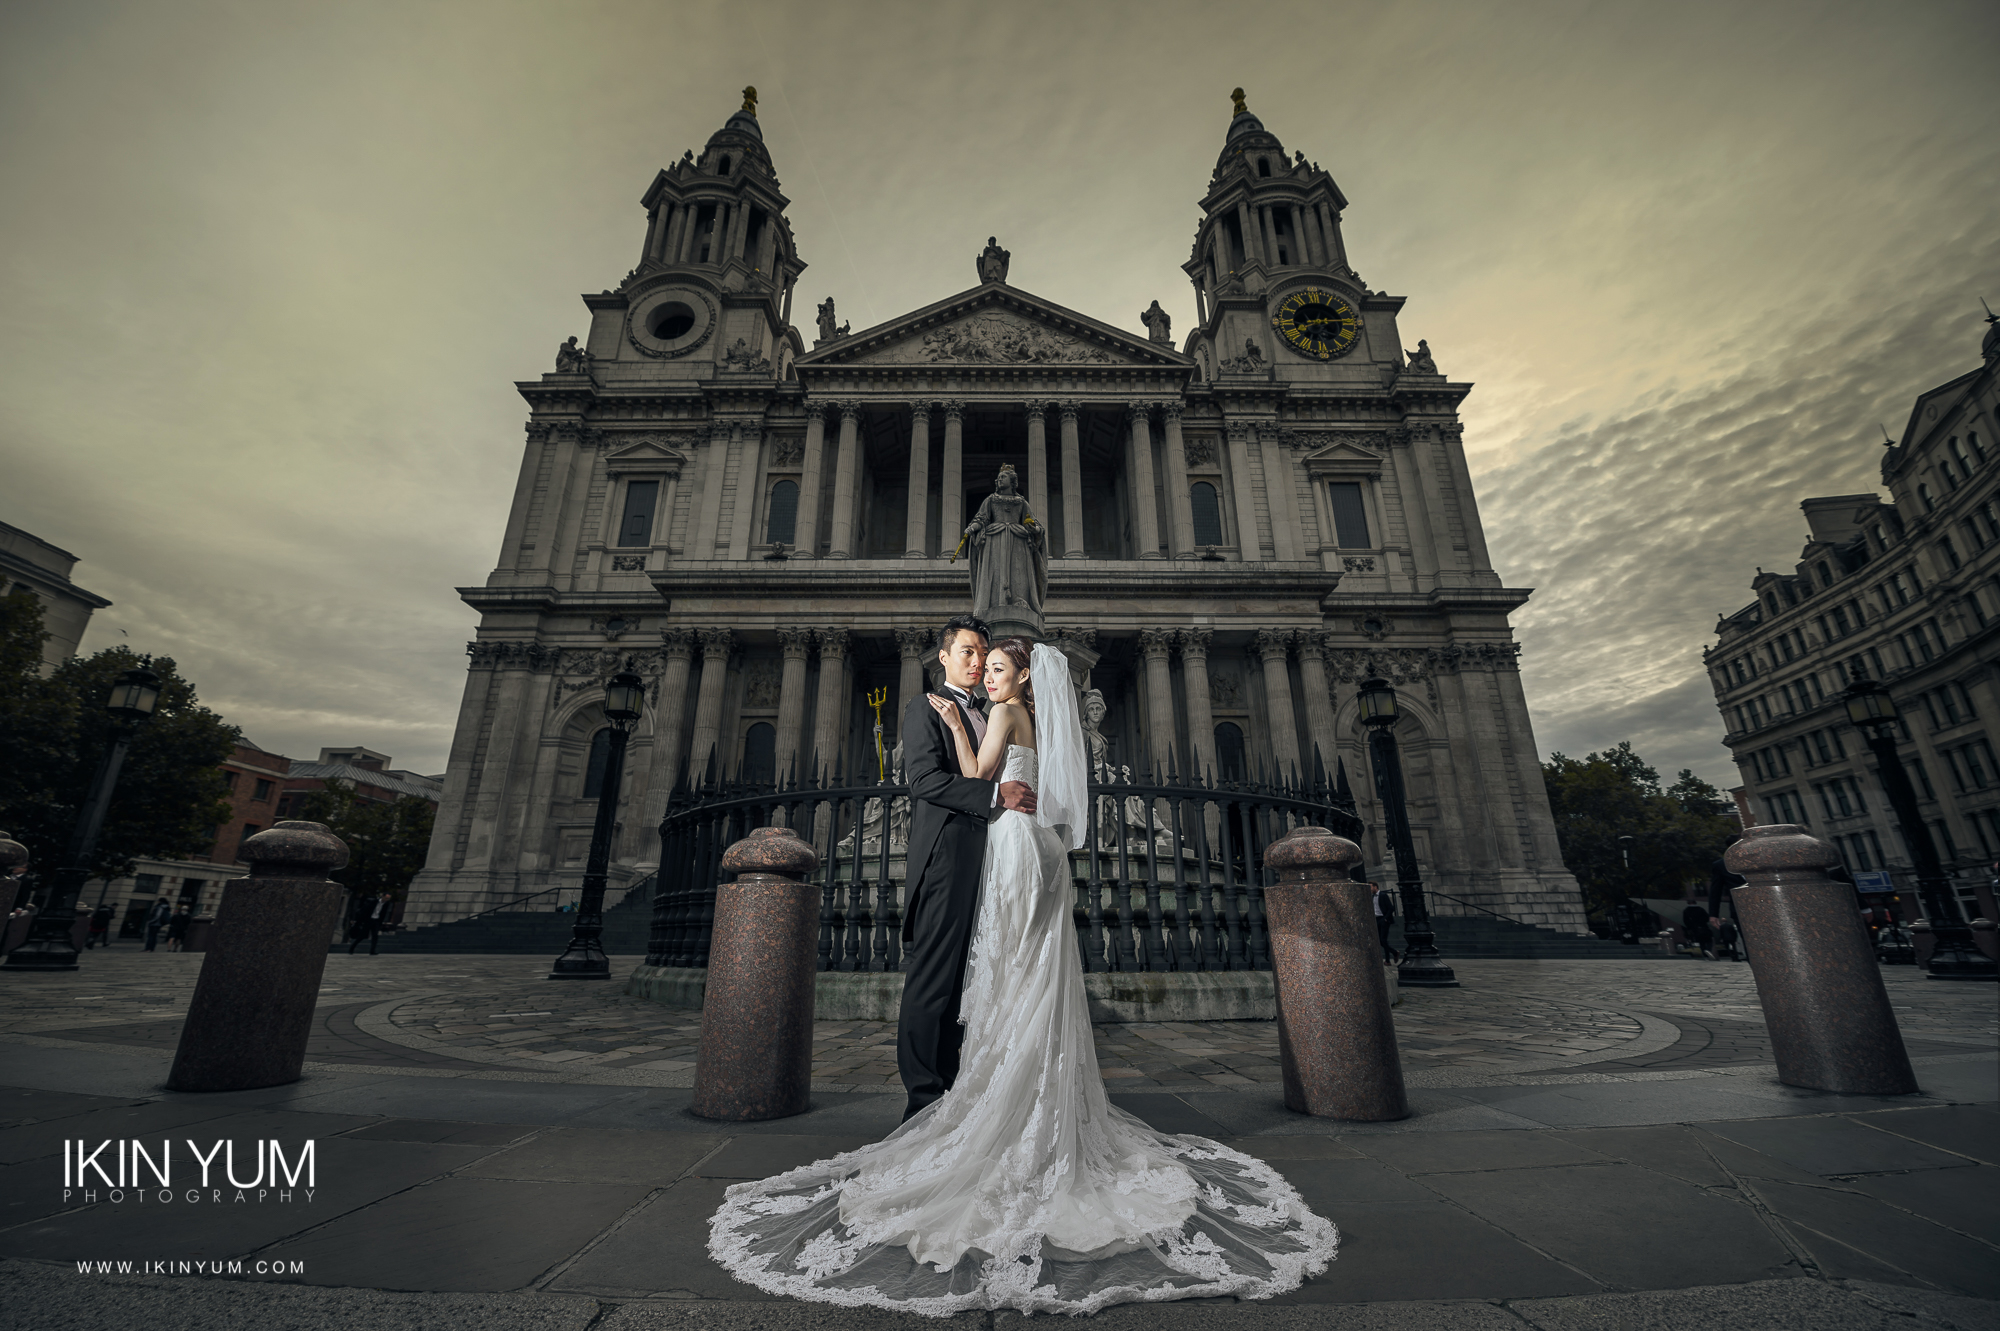 London Pre-Wedding Shoot - St Paul - London -  英国伦敦婚纱摄影  - Chinese wedding Photographer